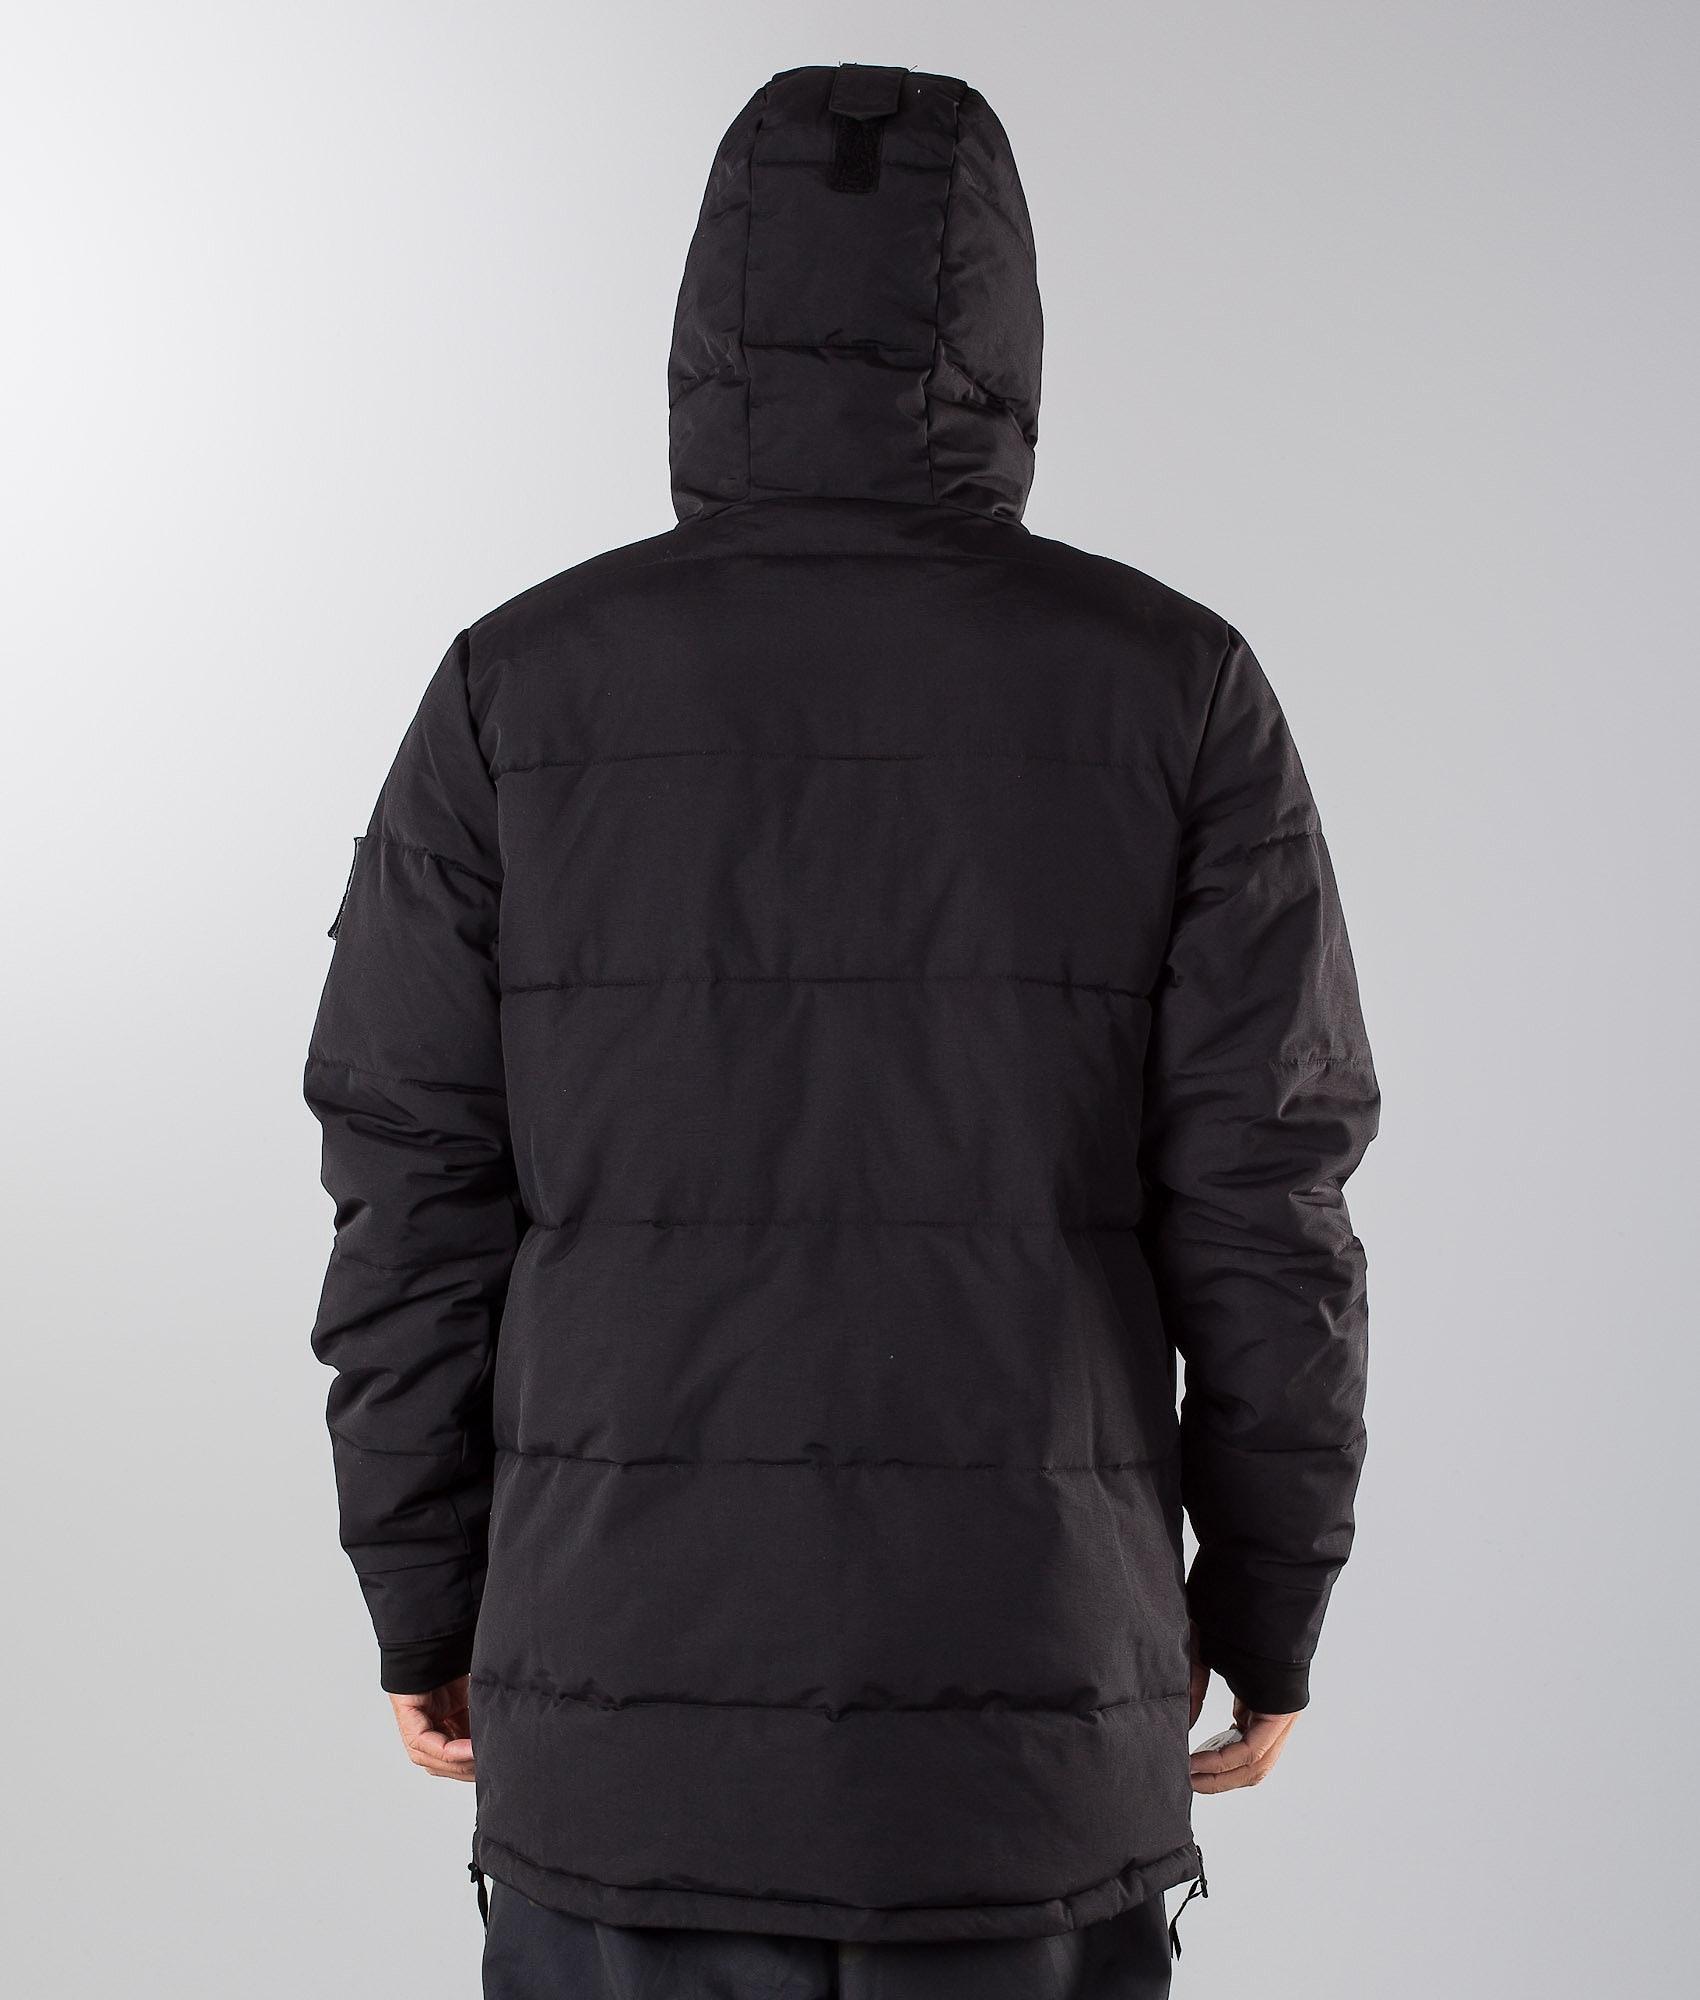 463216e1b8e3 Dope Puffer Snowboard Jacket Black - Ridestore.com